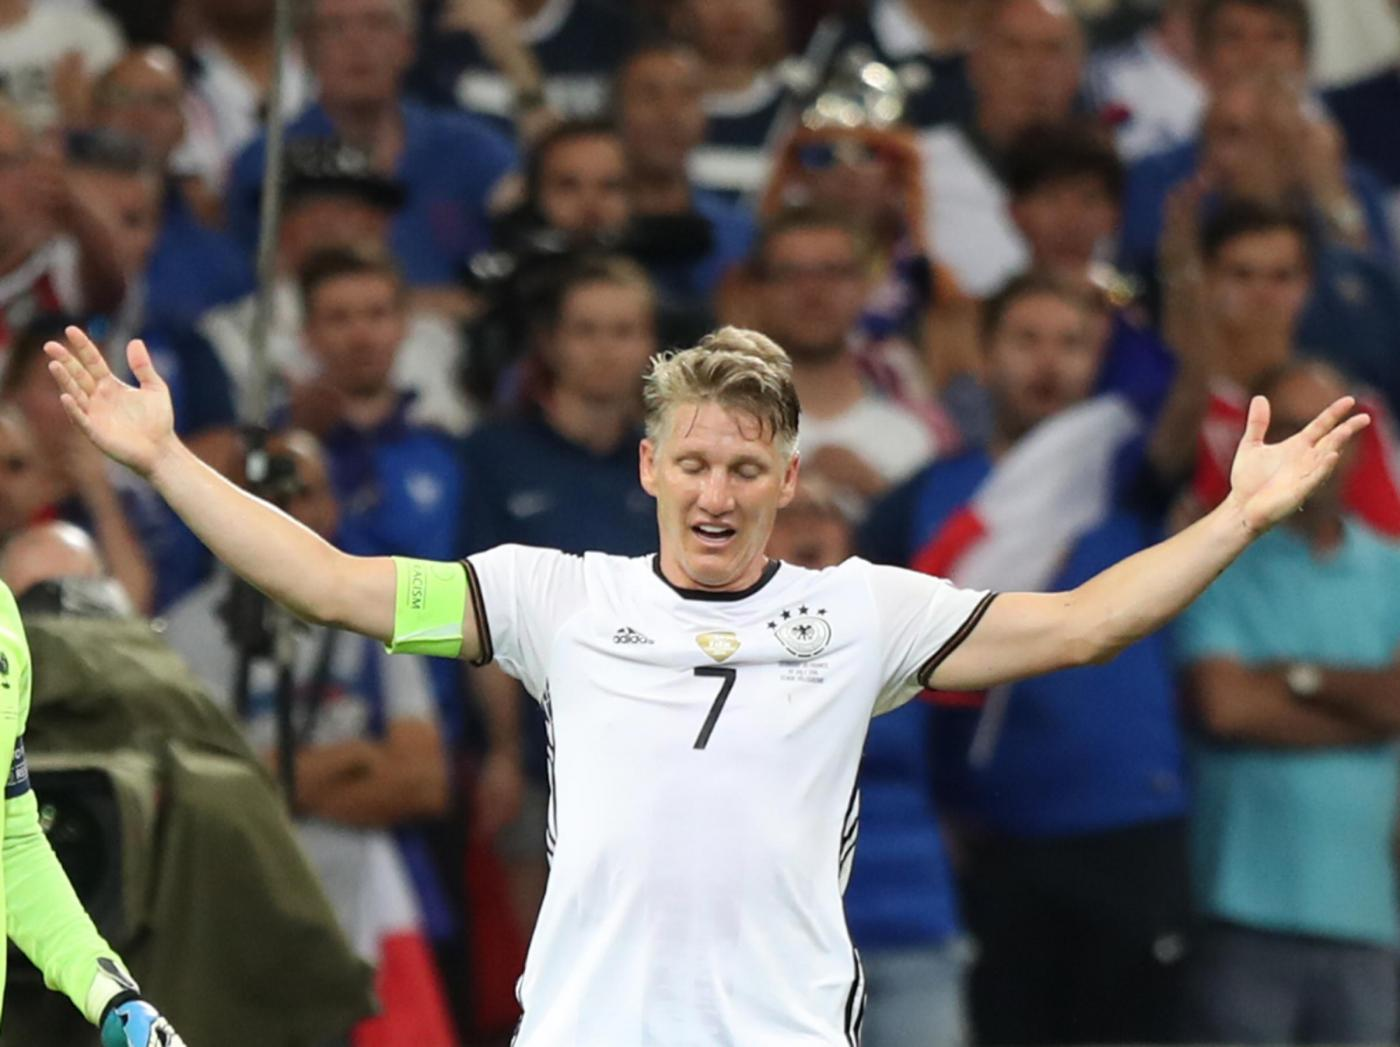 Manchester United: trattativa per la buonuscita di Schweinsteiger